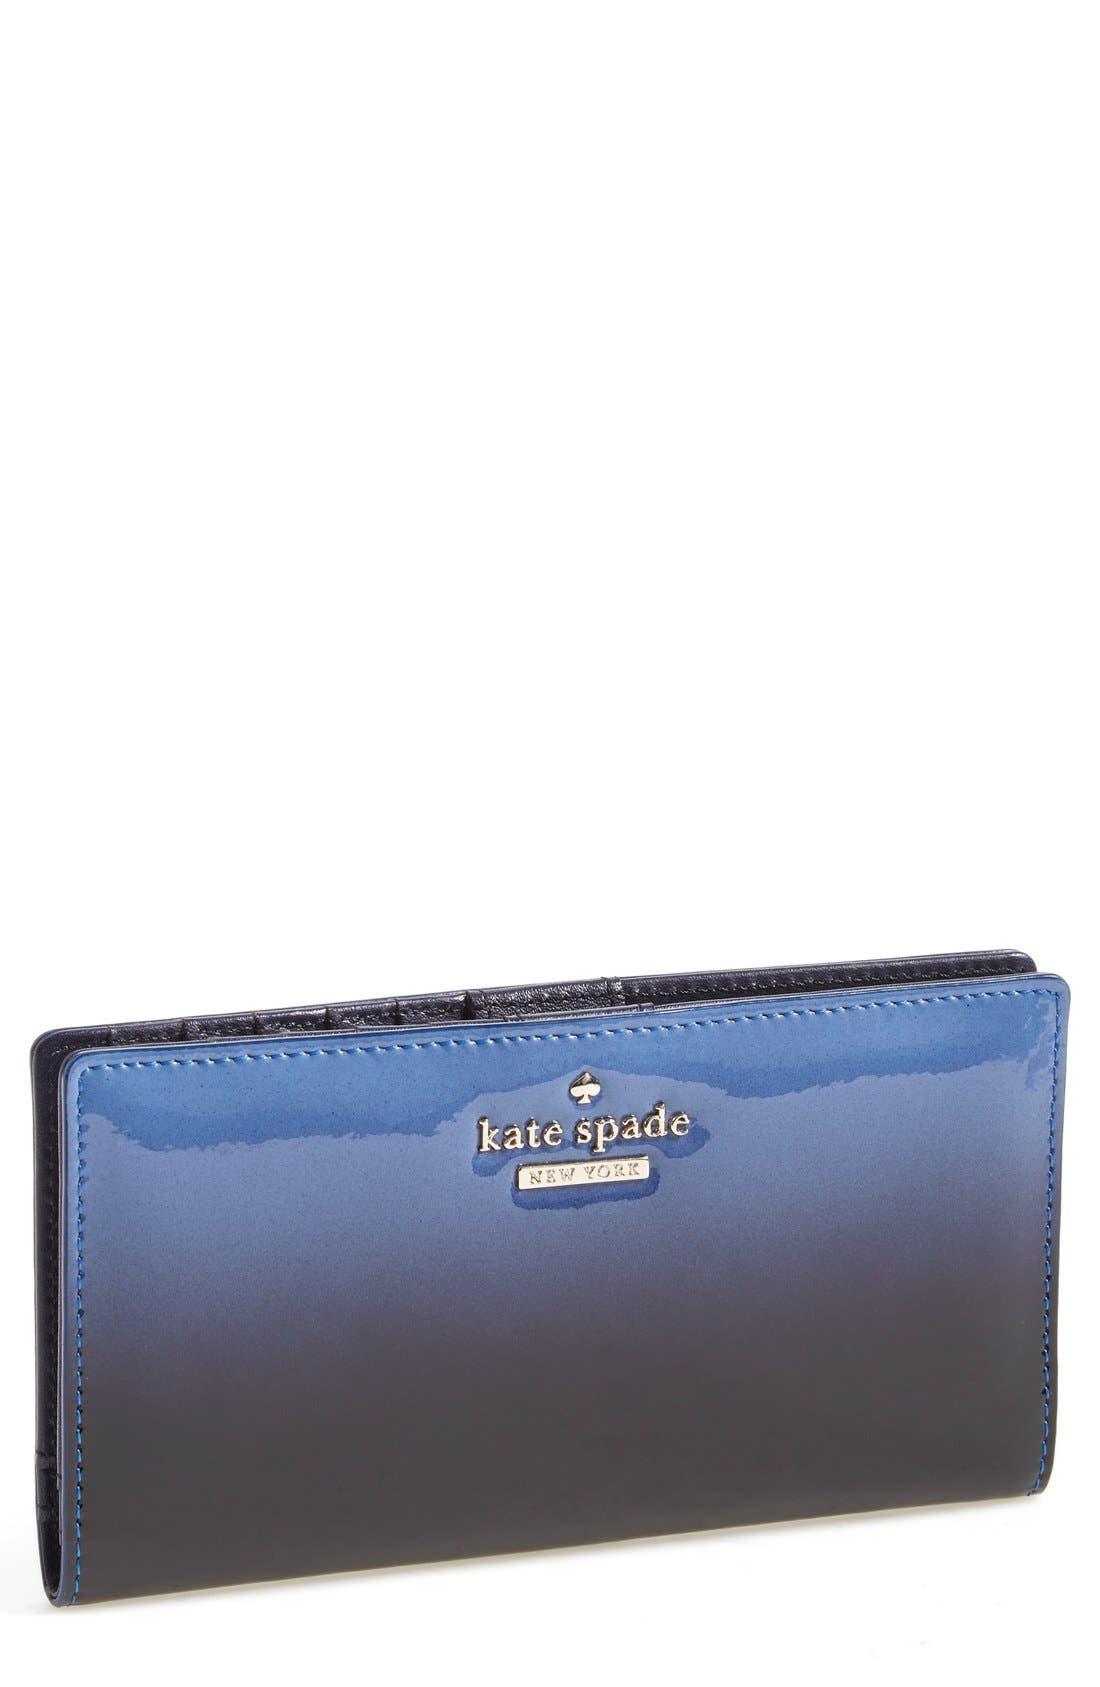 Main Image - kate spade new york 'cedar street - ombré patent stacy' leather clutch wallet